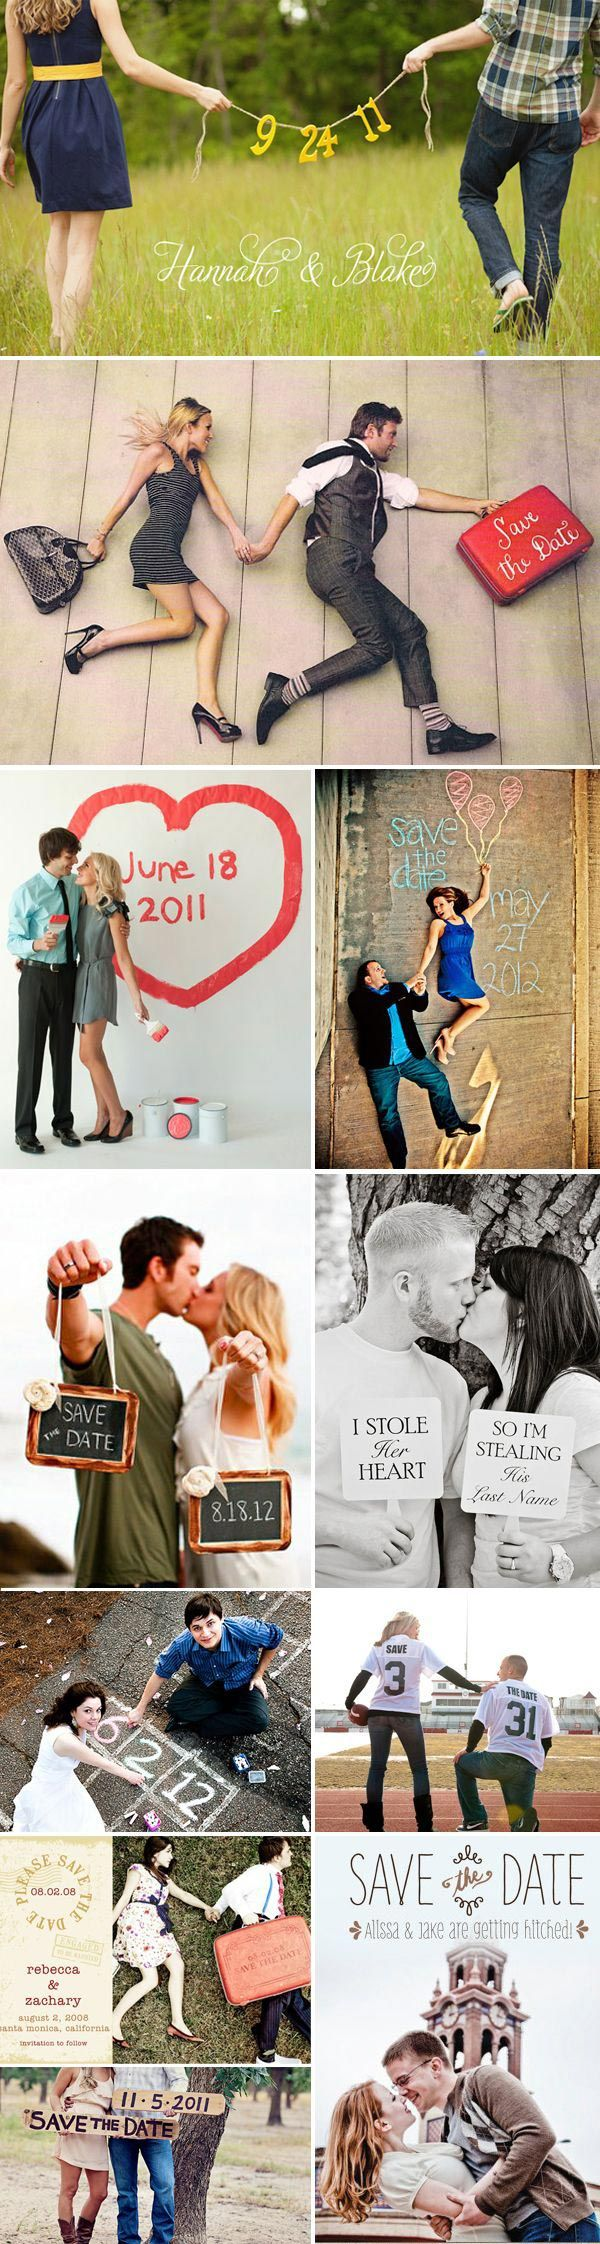 Fun-save-the-date-wedding-idea